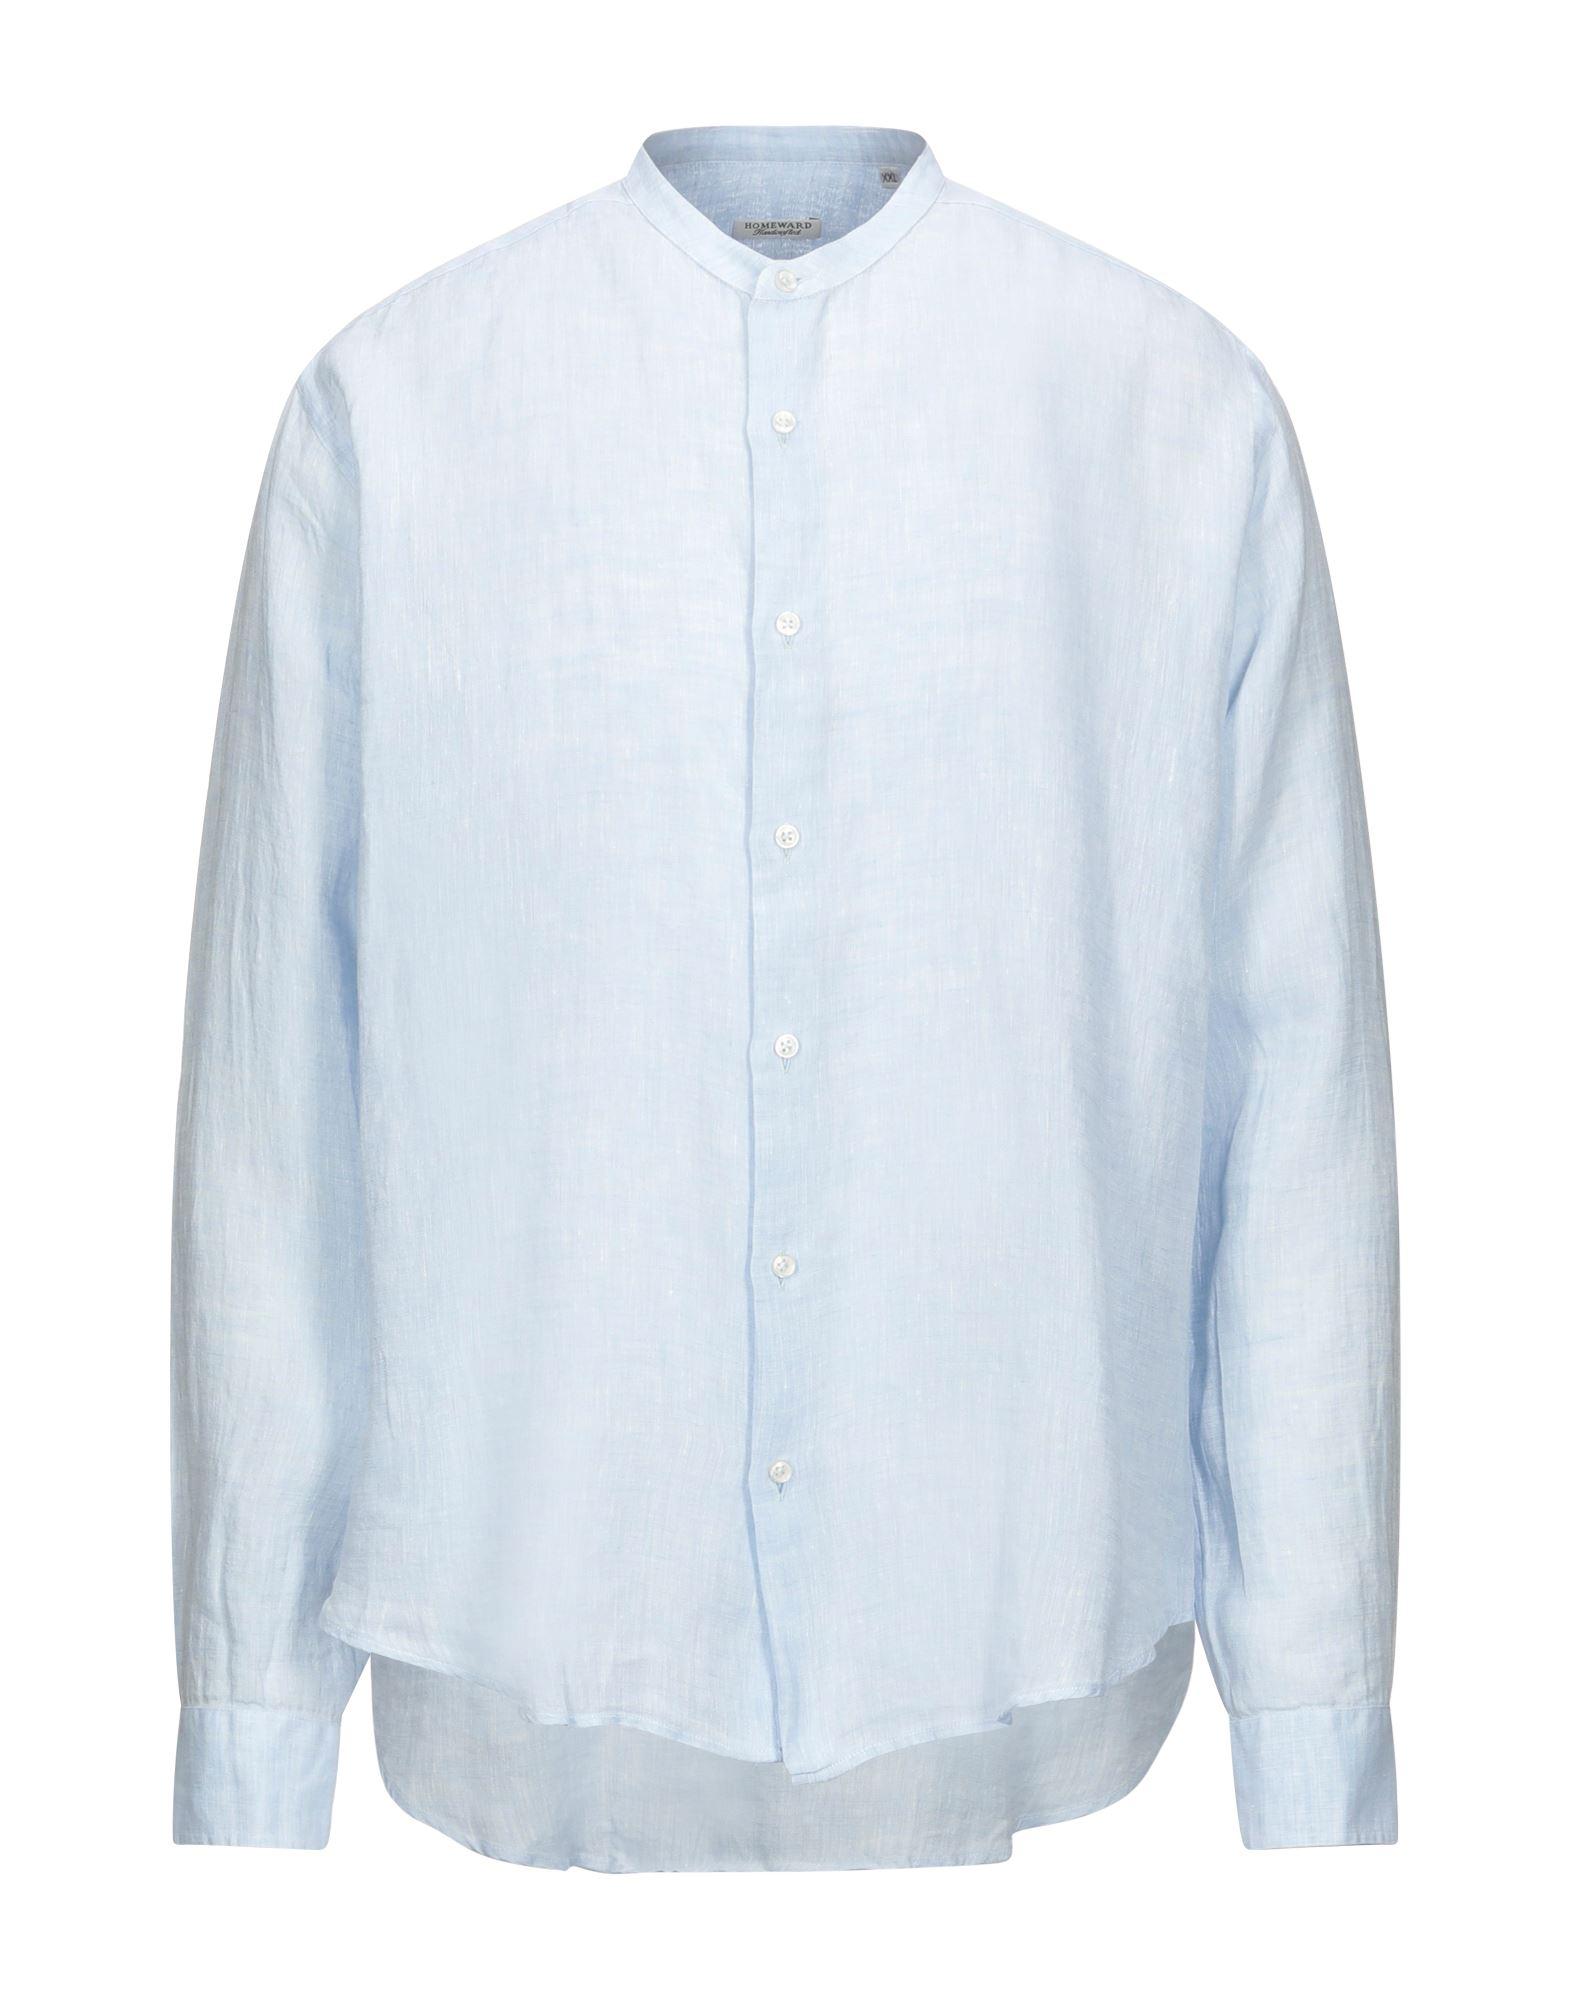 Фото - HOMEWARD CLOTHES Pубашка homeward clothes бермуды